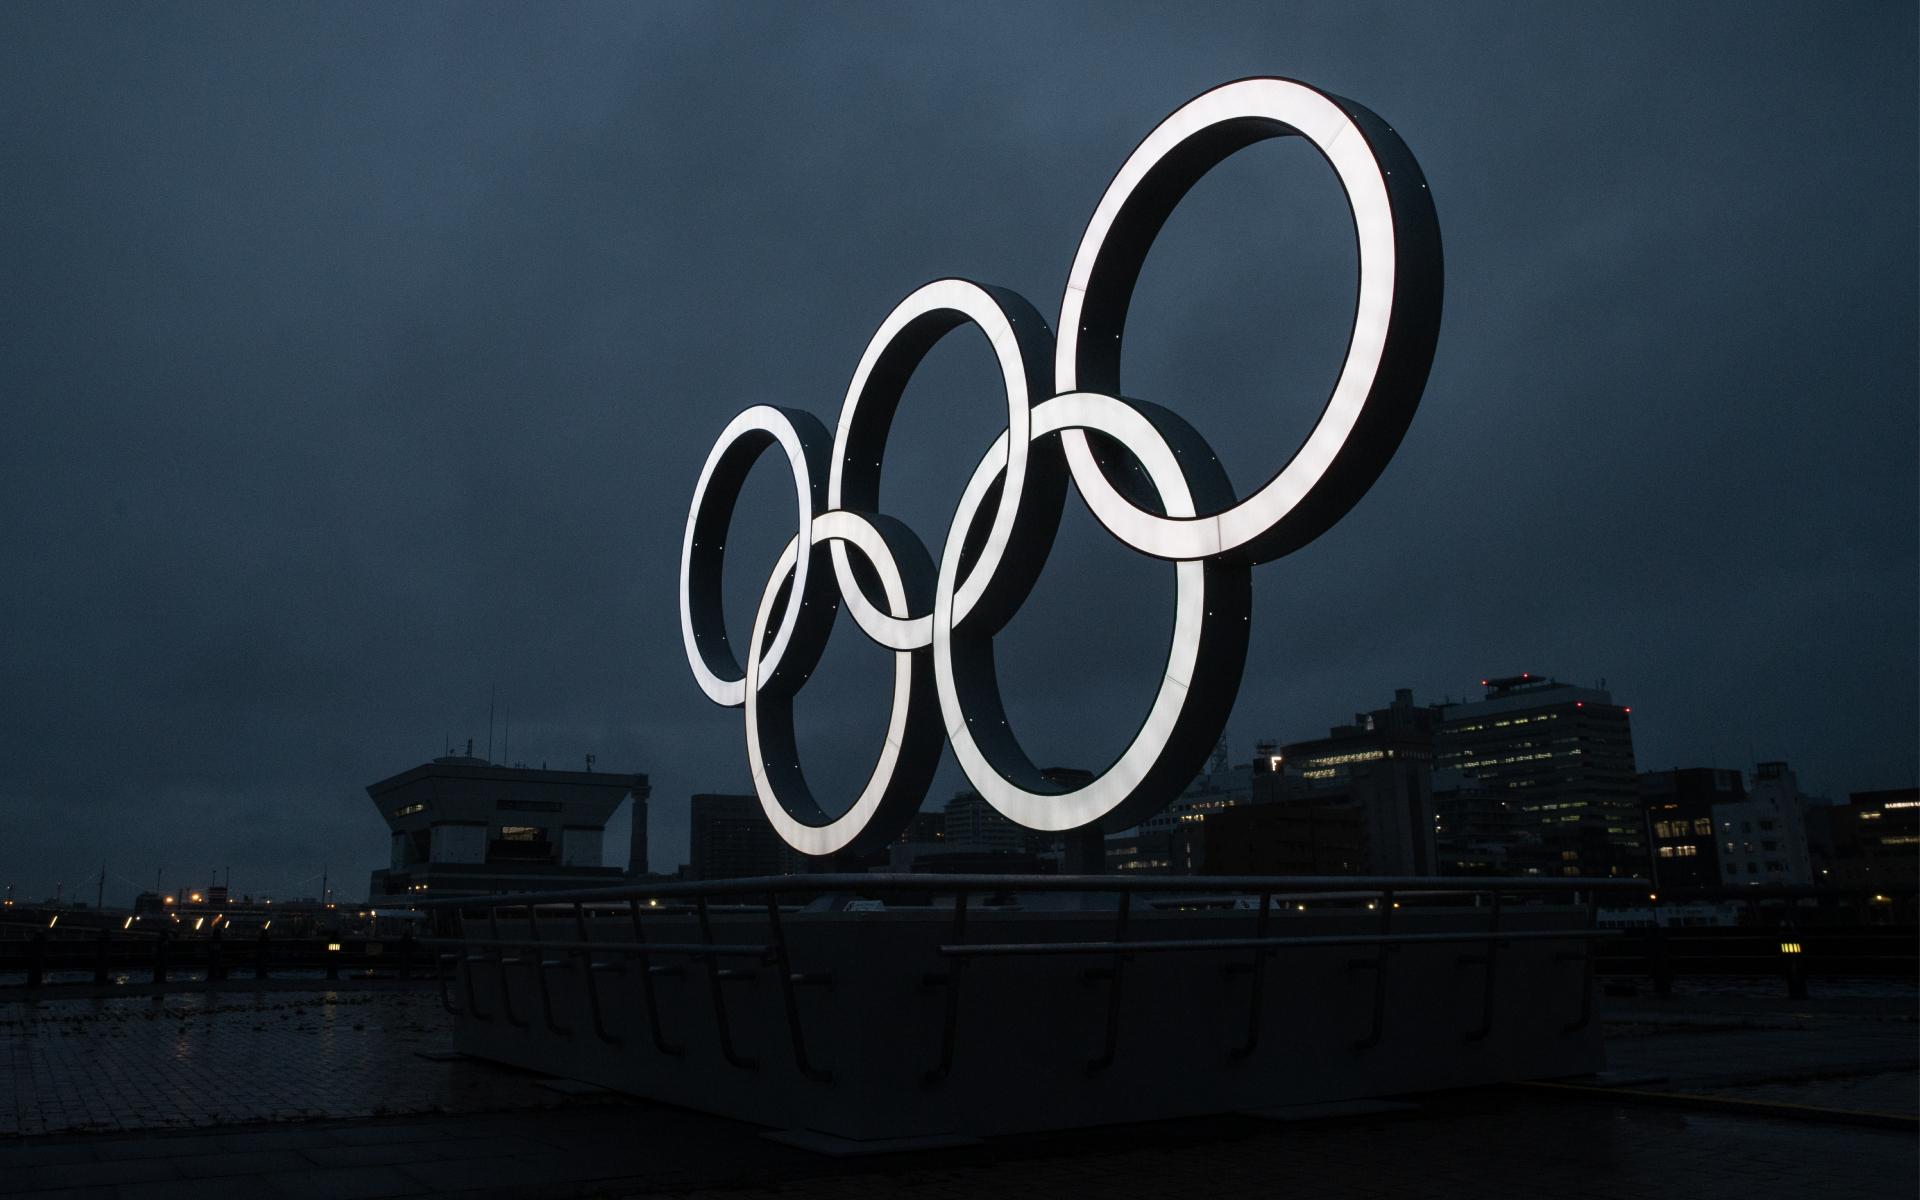 Фото: Takashi Aoyama/Getty Images